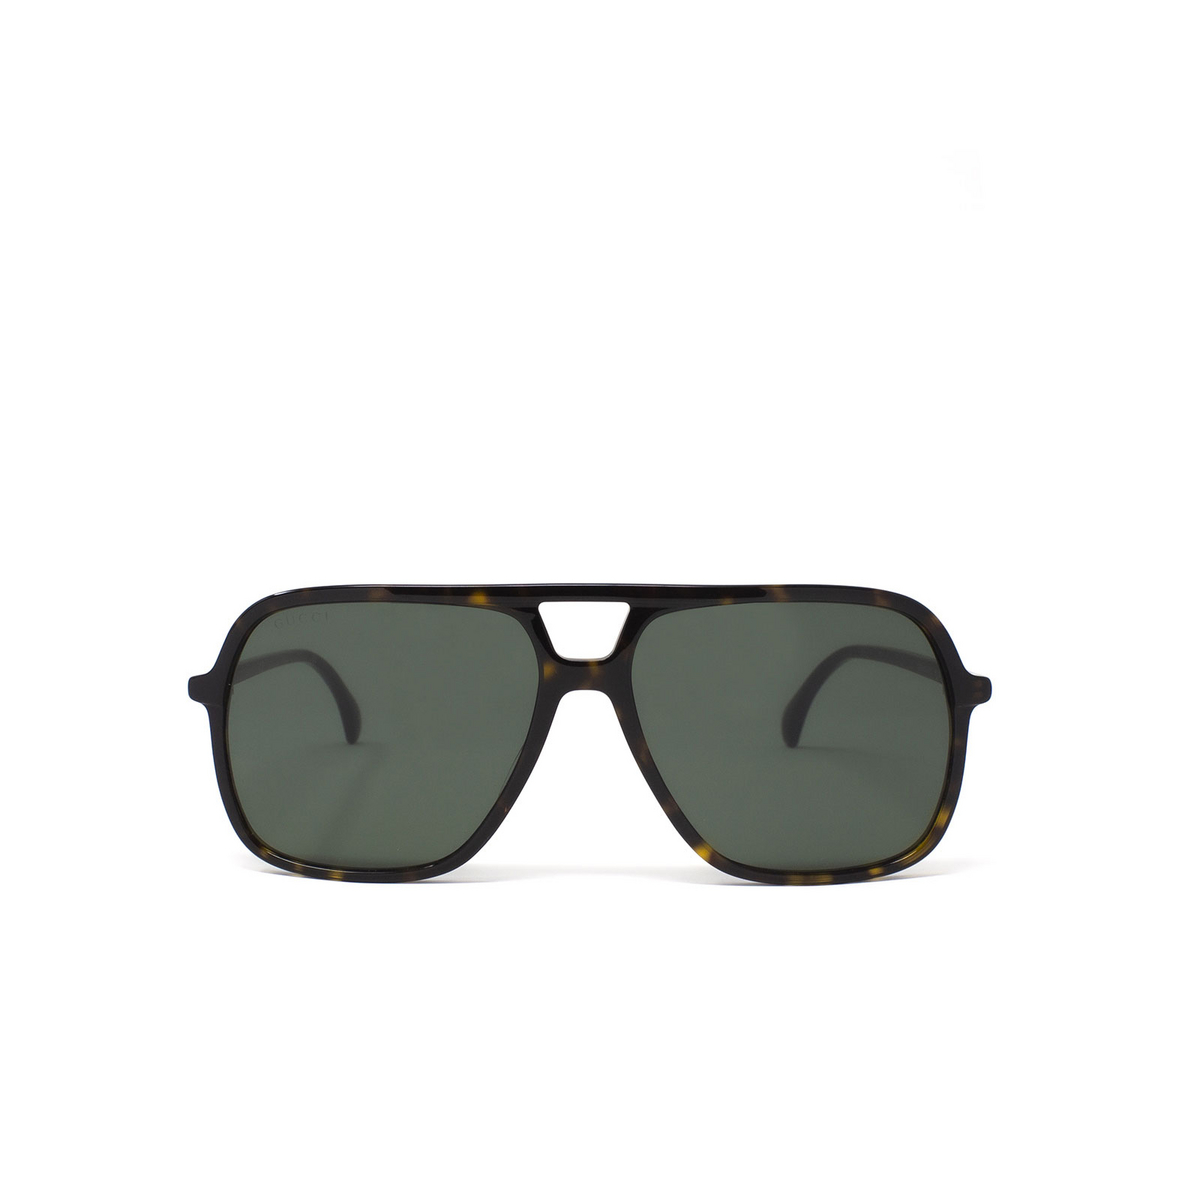 Gucci® Aviator Sunglasses: GG0545S color Havana 002 - 1/3.